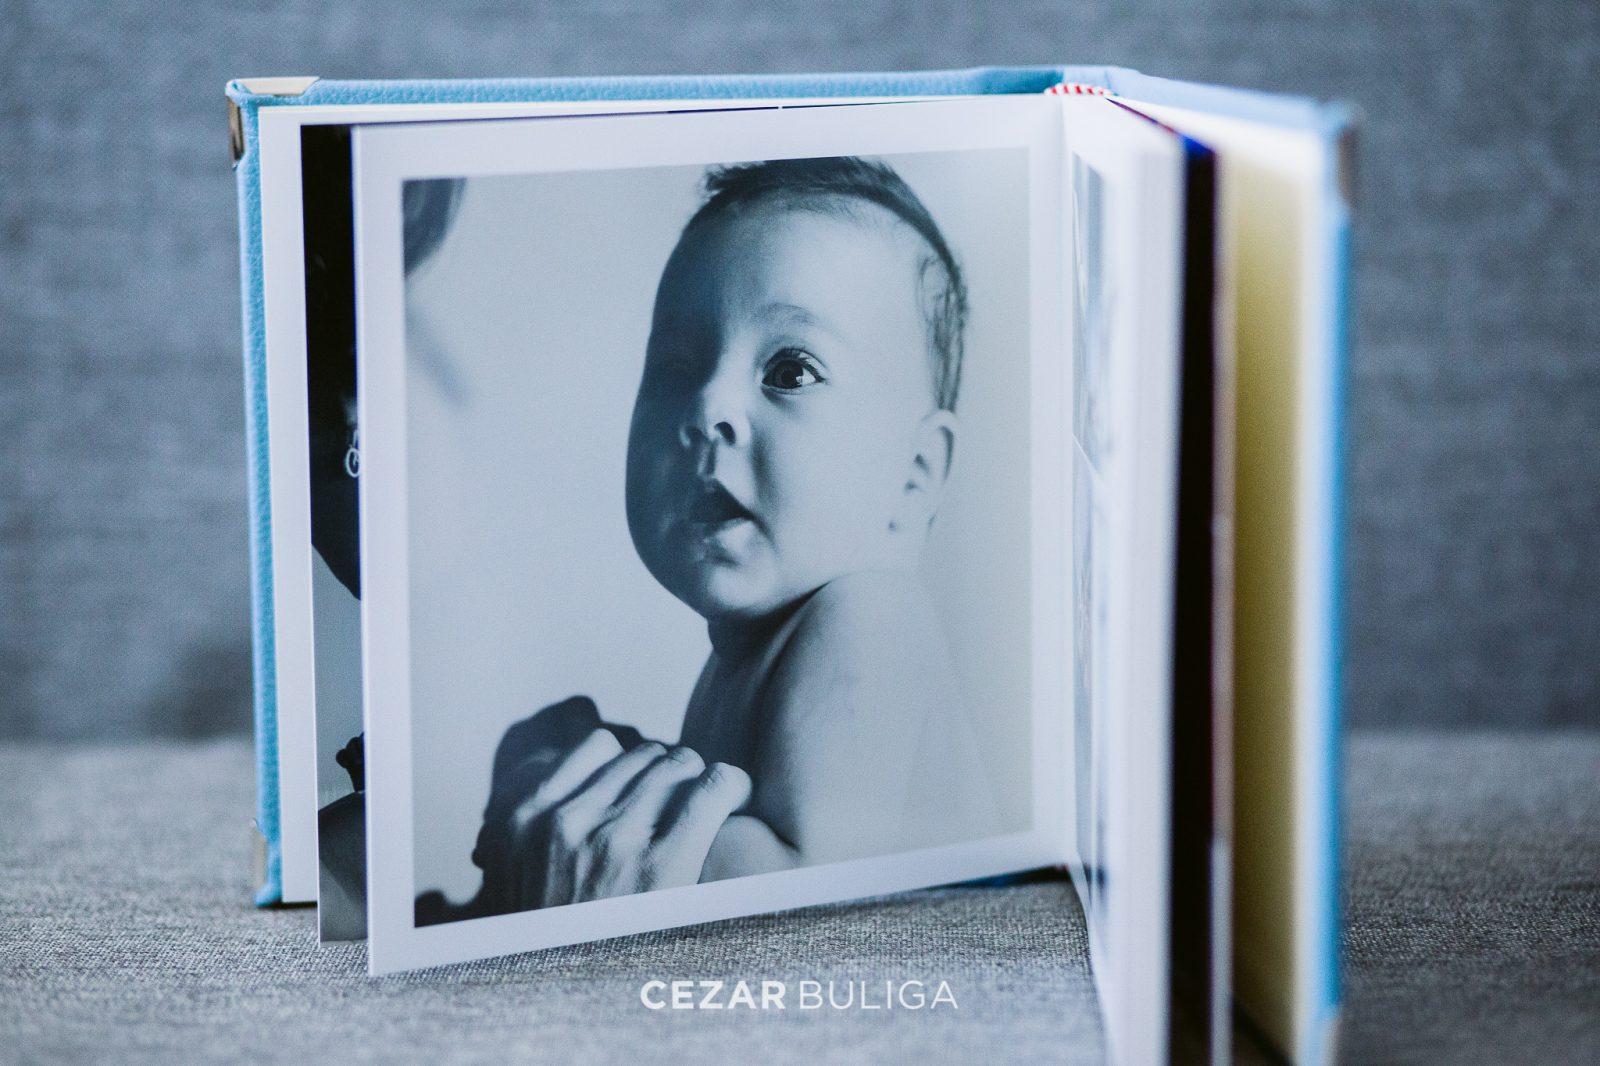 albume de nunta si botez fotograf profesionist targu mures buliga cezar coperta premium